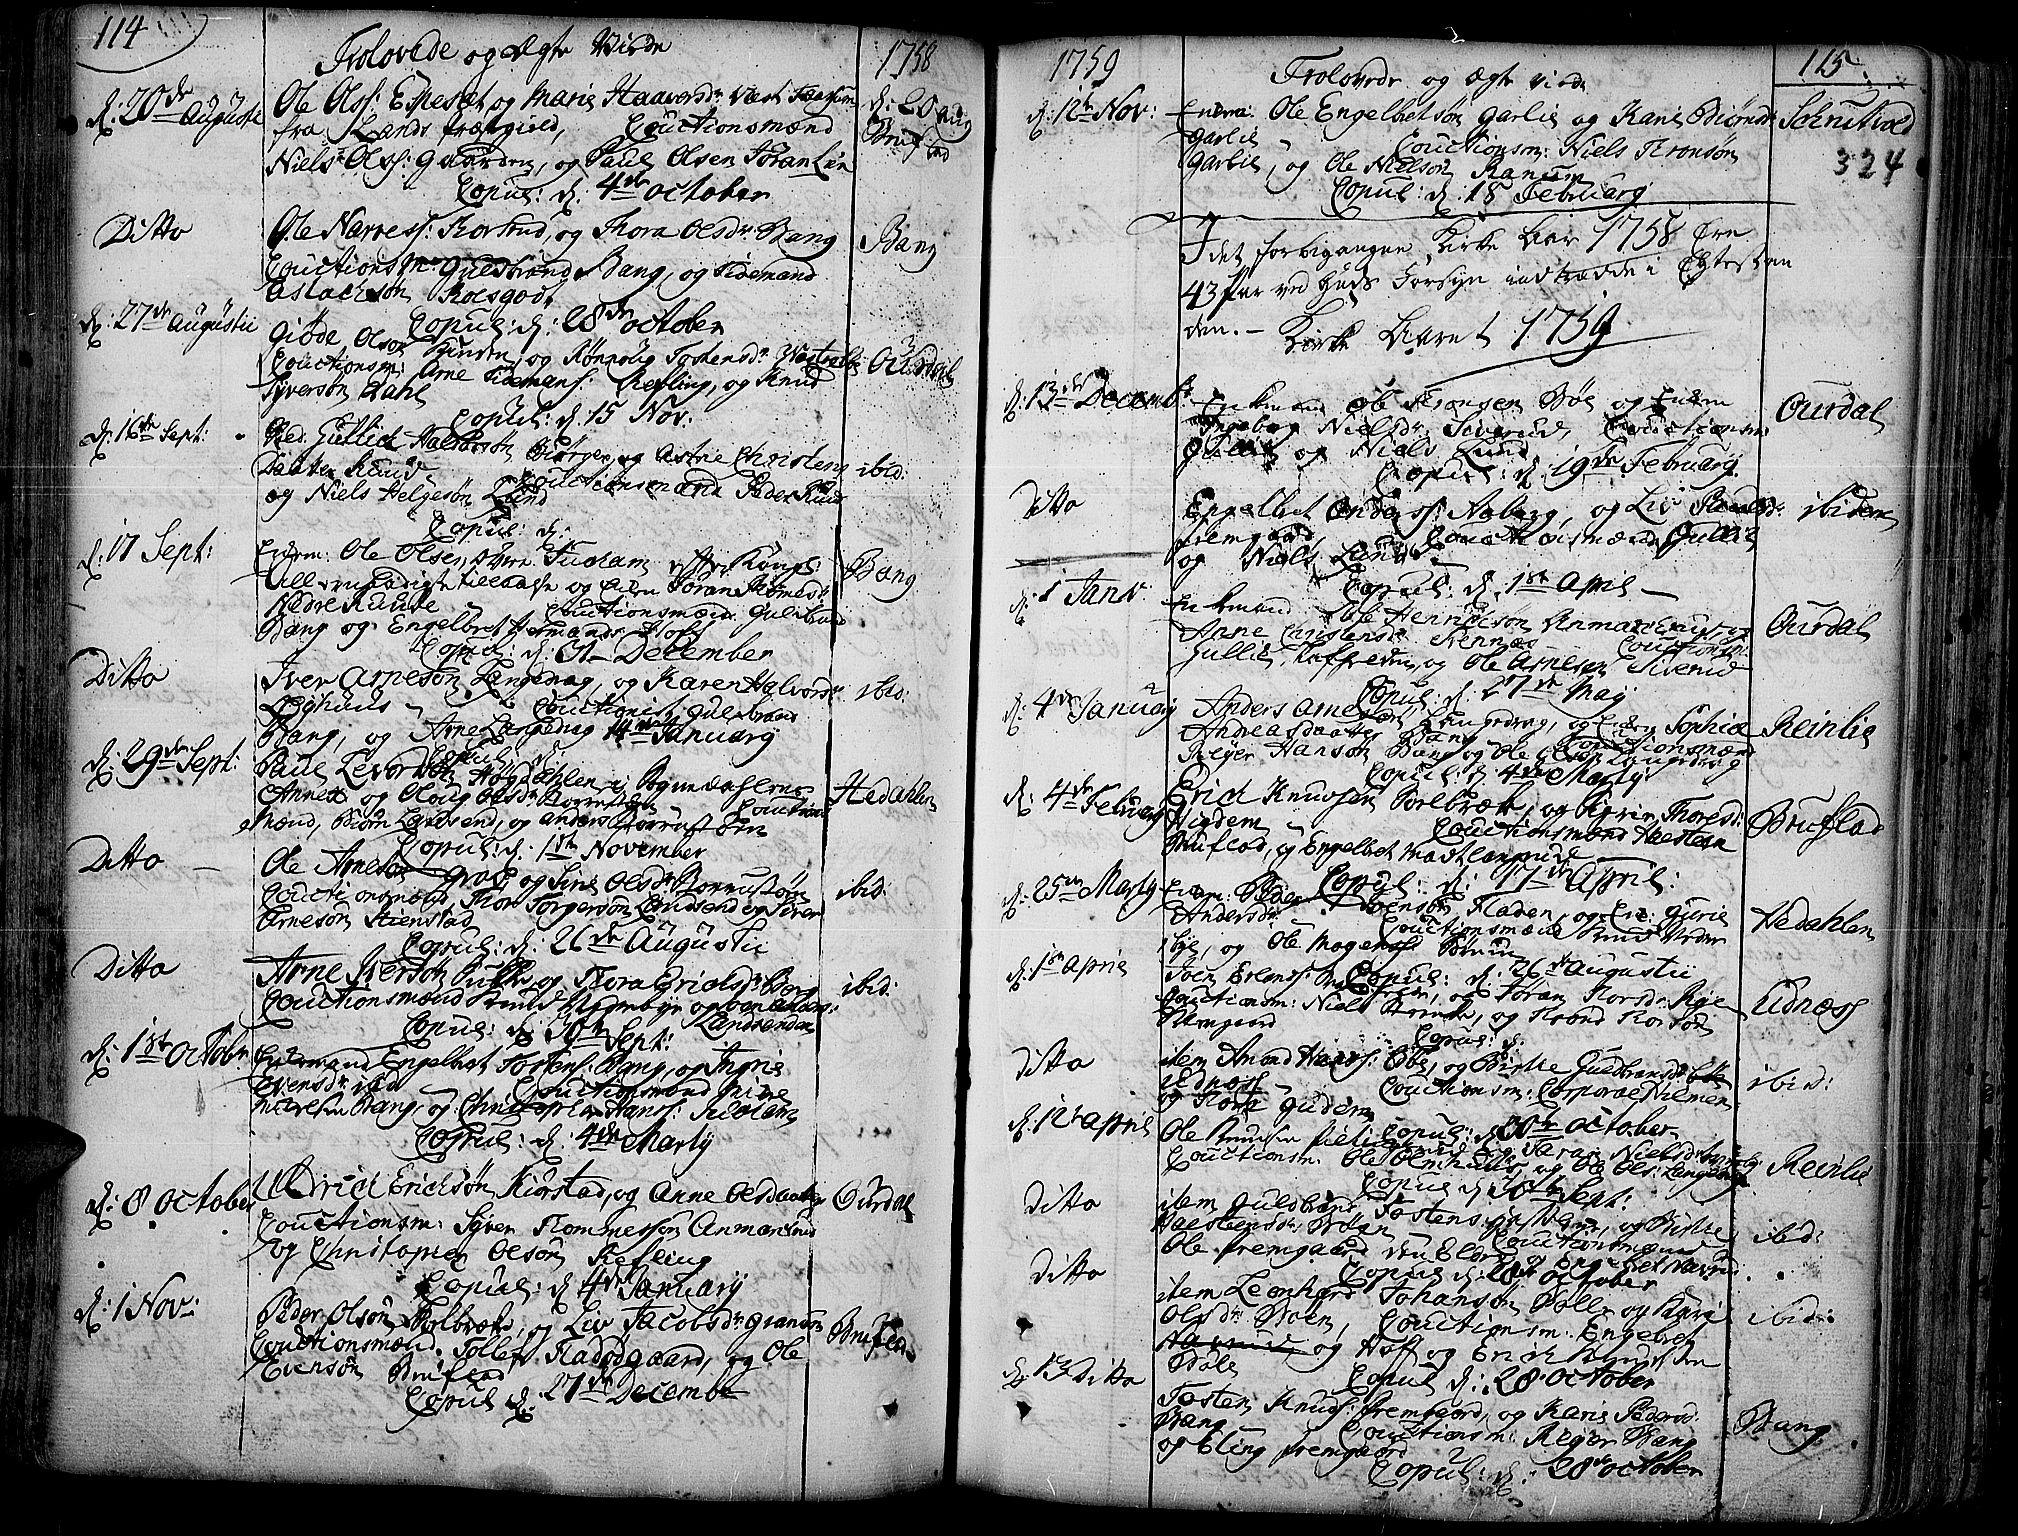 SAH, Aurdal prestekontor, Ministerialbok nr. 4, 1730-1762, s. 114-115